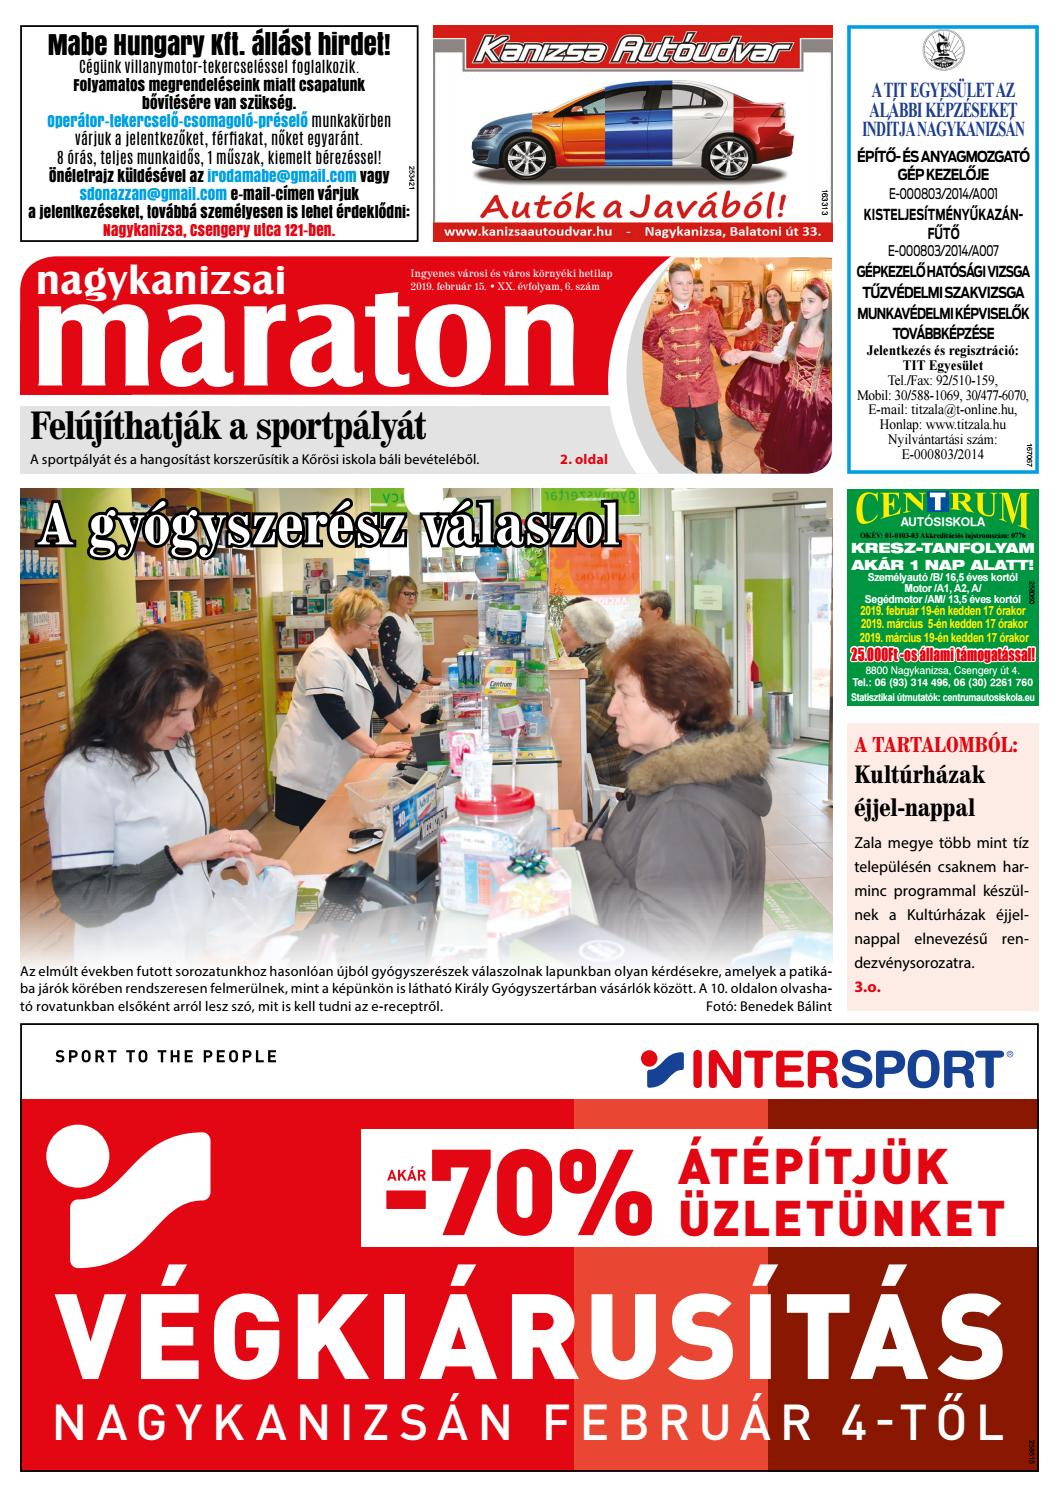 Nagykanizsai Maraton - 2019. 02. 15. by Maraton Lapcsoport Kft. - issuu 00bc41778e